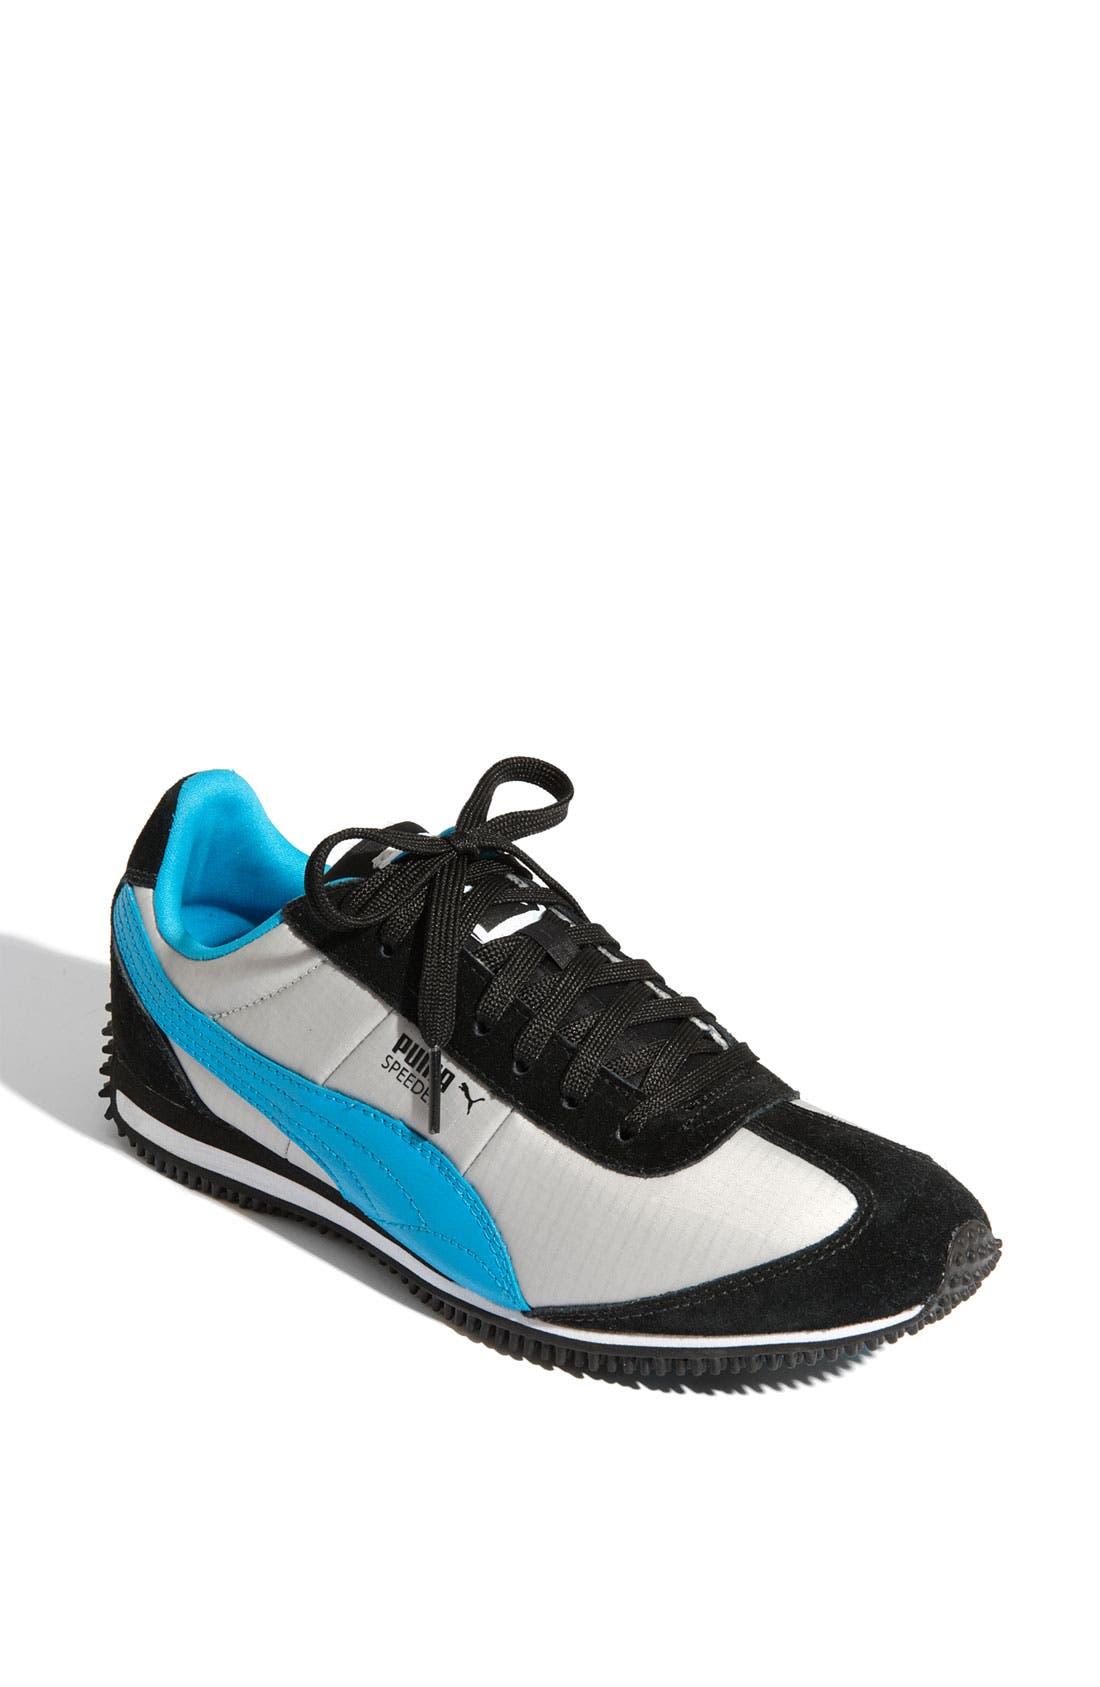 Alternate Image 1 Selected - PUMA 'Speeder' Sneaker (Women)